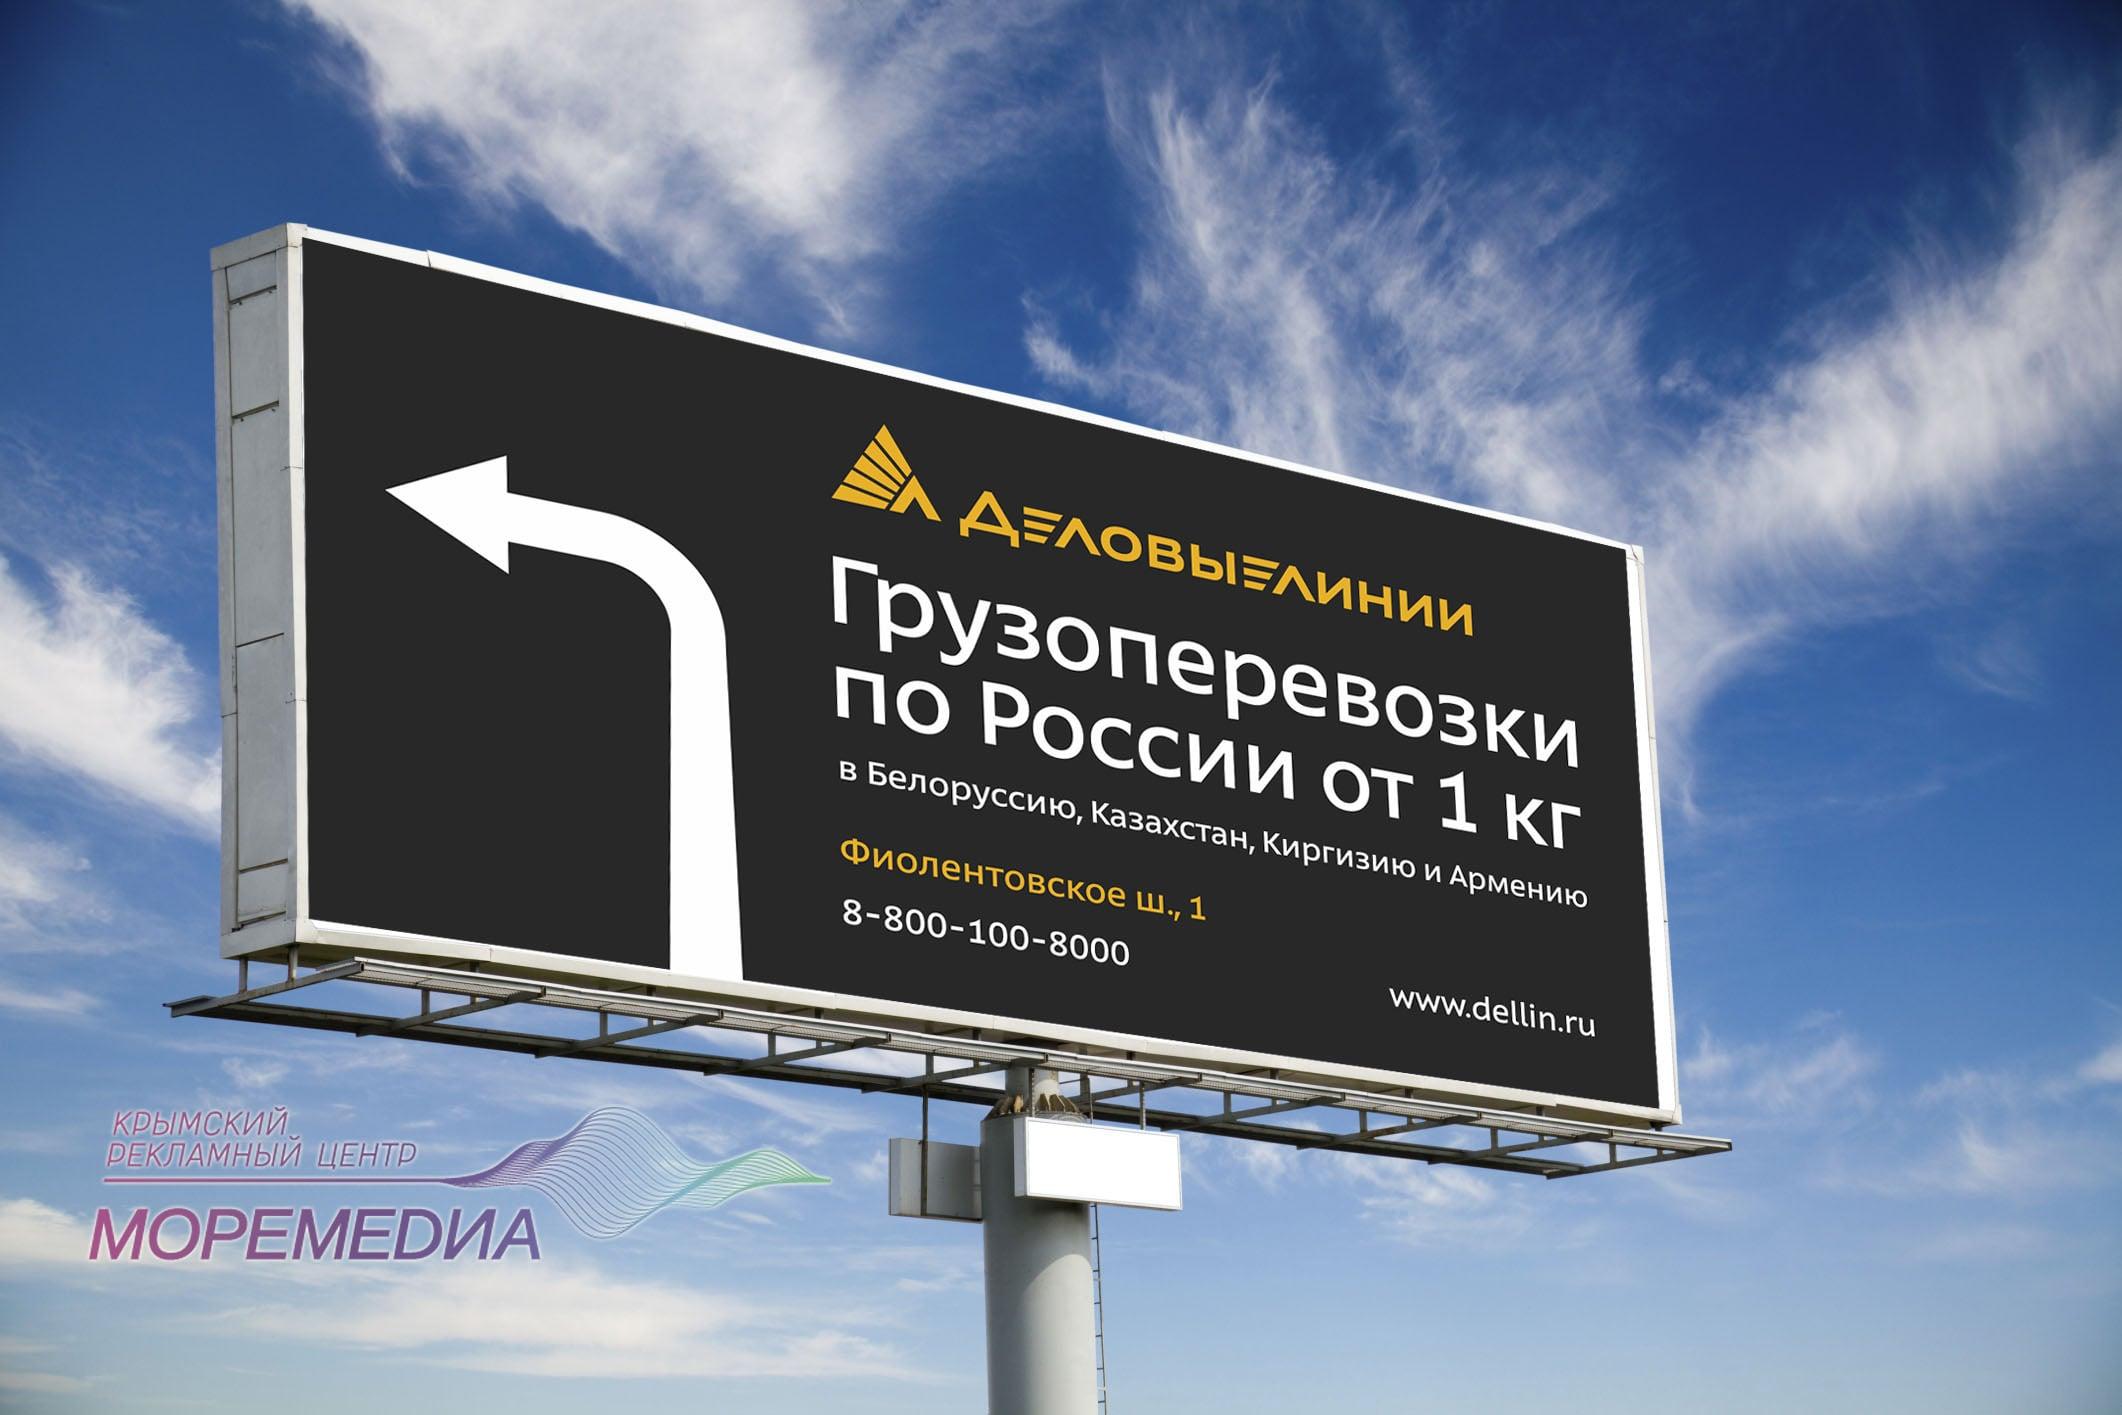 выкрикнул юридические услуги реклама на билбордах картинки худобы заключена